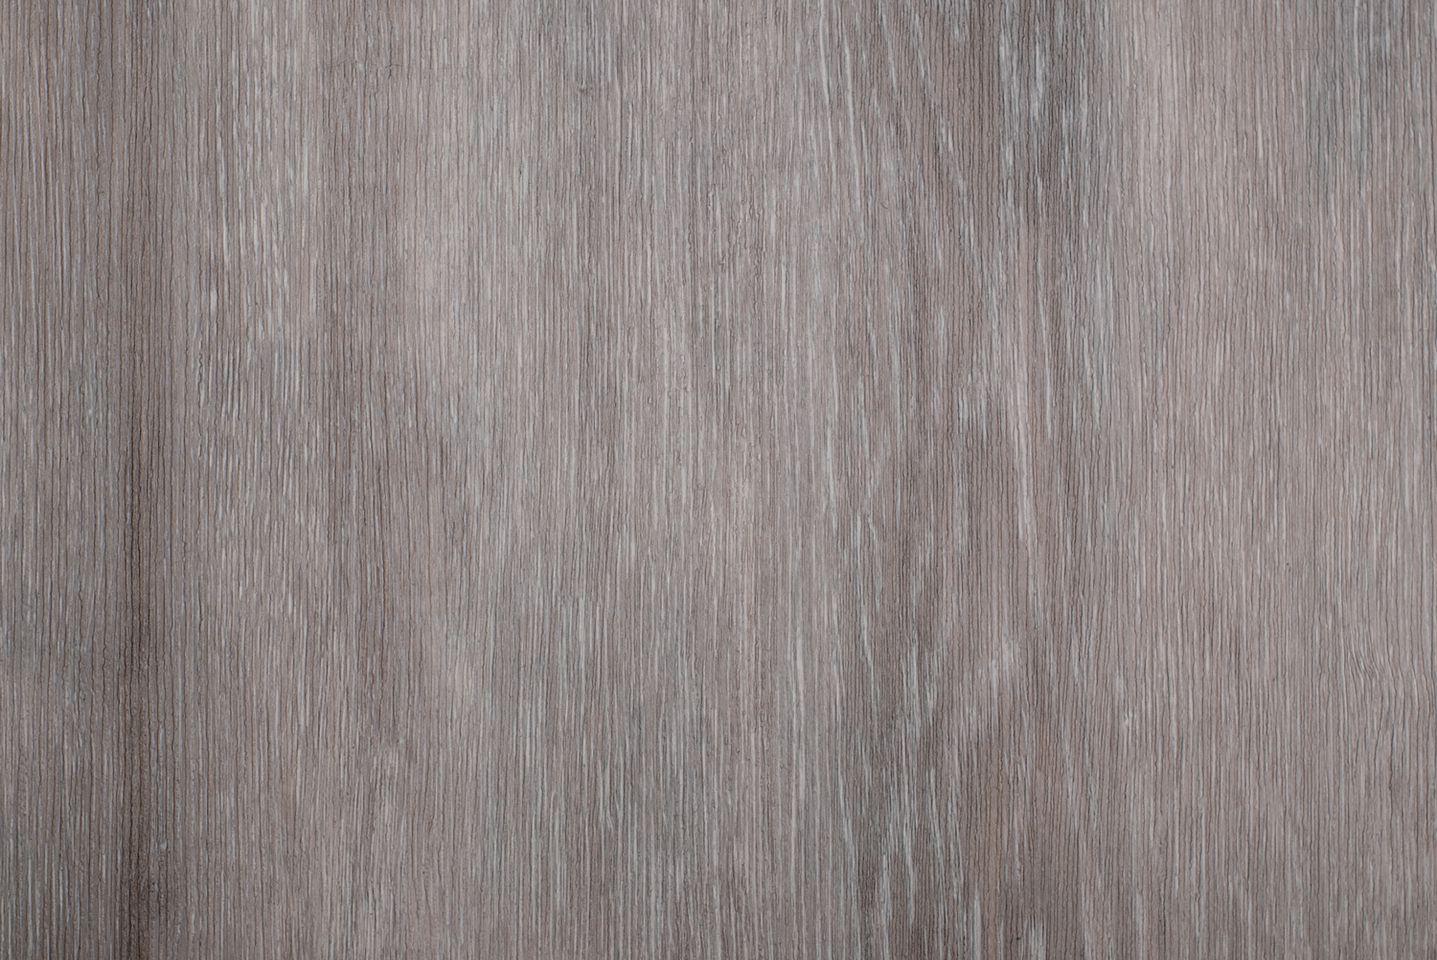 Floer dorpen pvc gastel grauw eiken grijze vinyl plank vloer